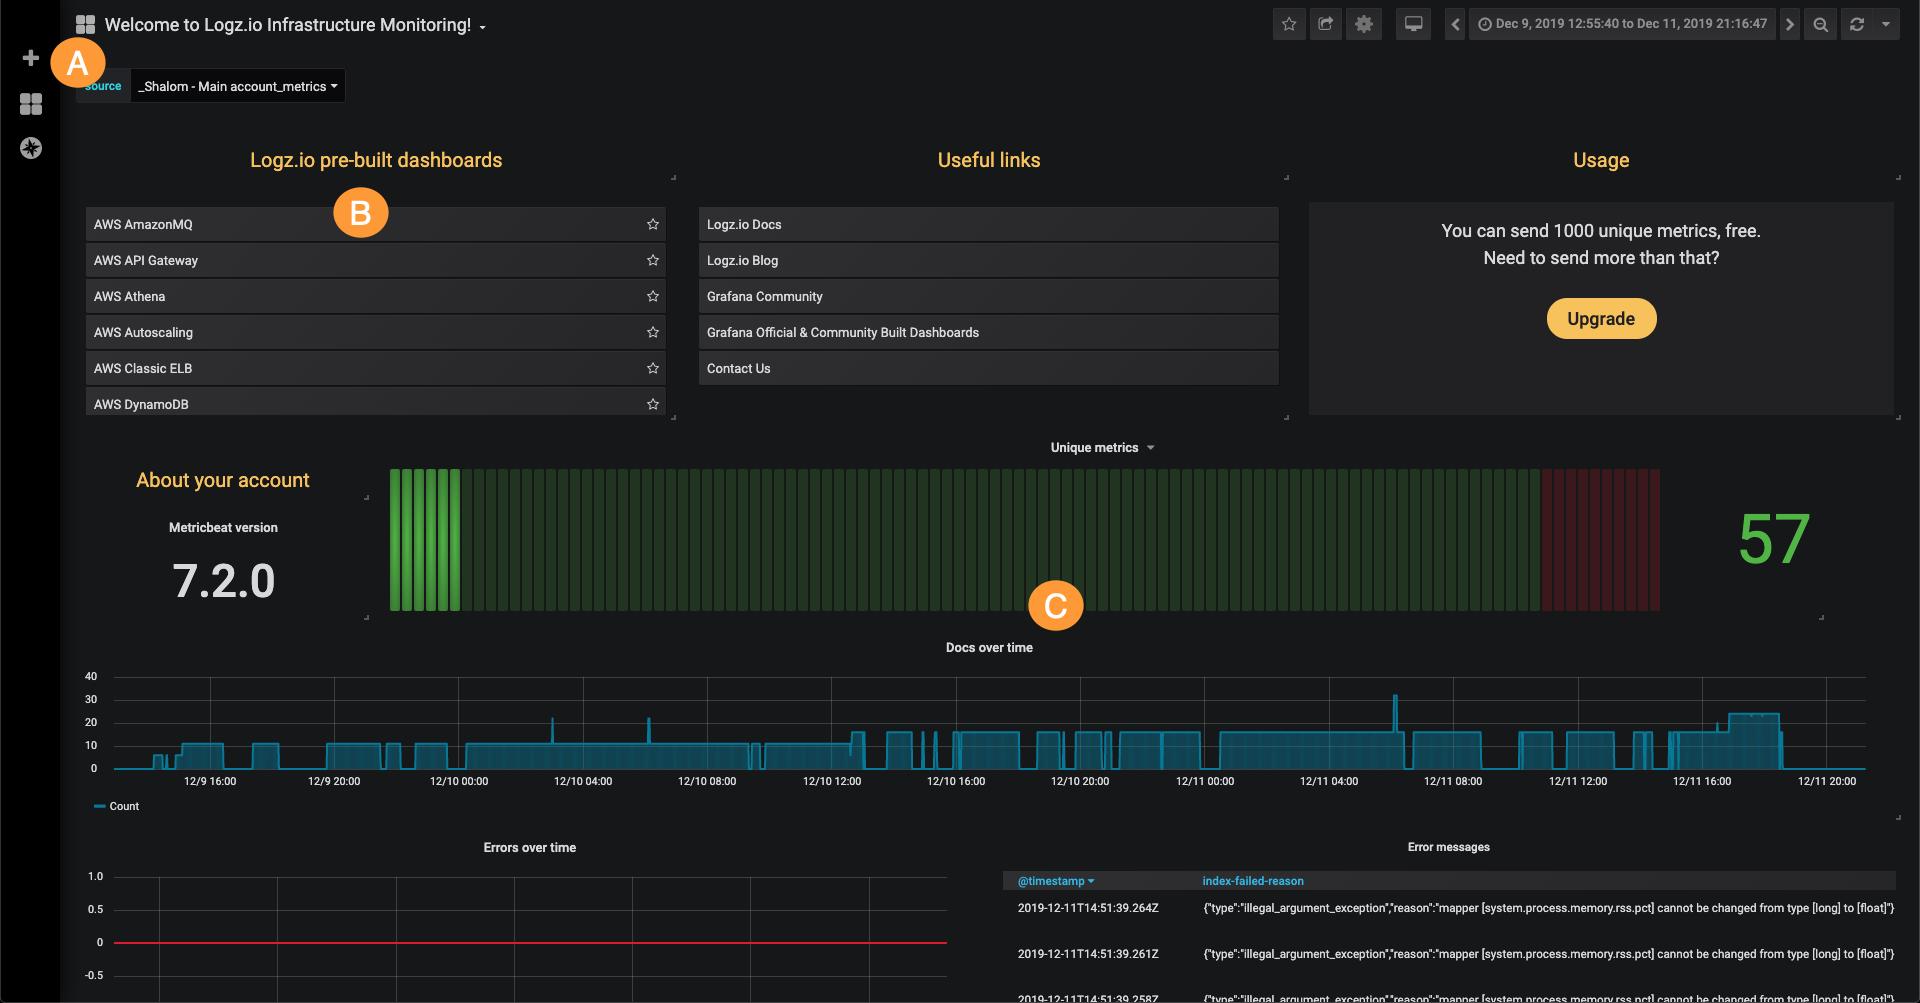 Logz.io Infrastructure Monitoring